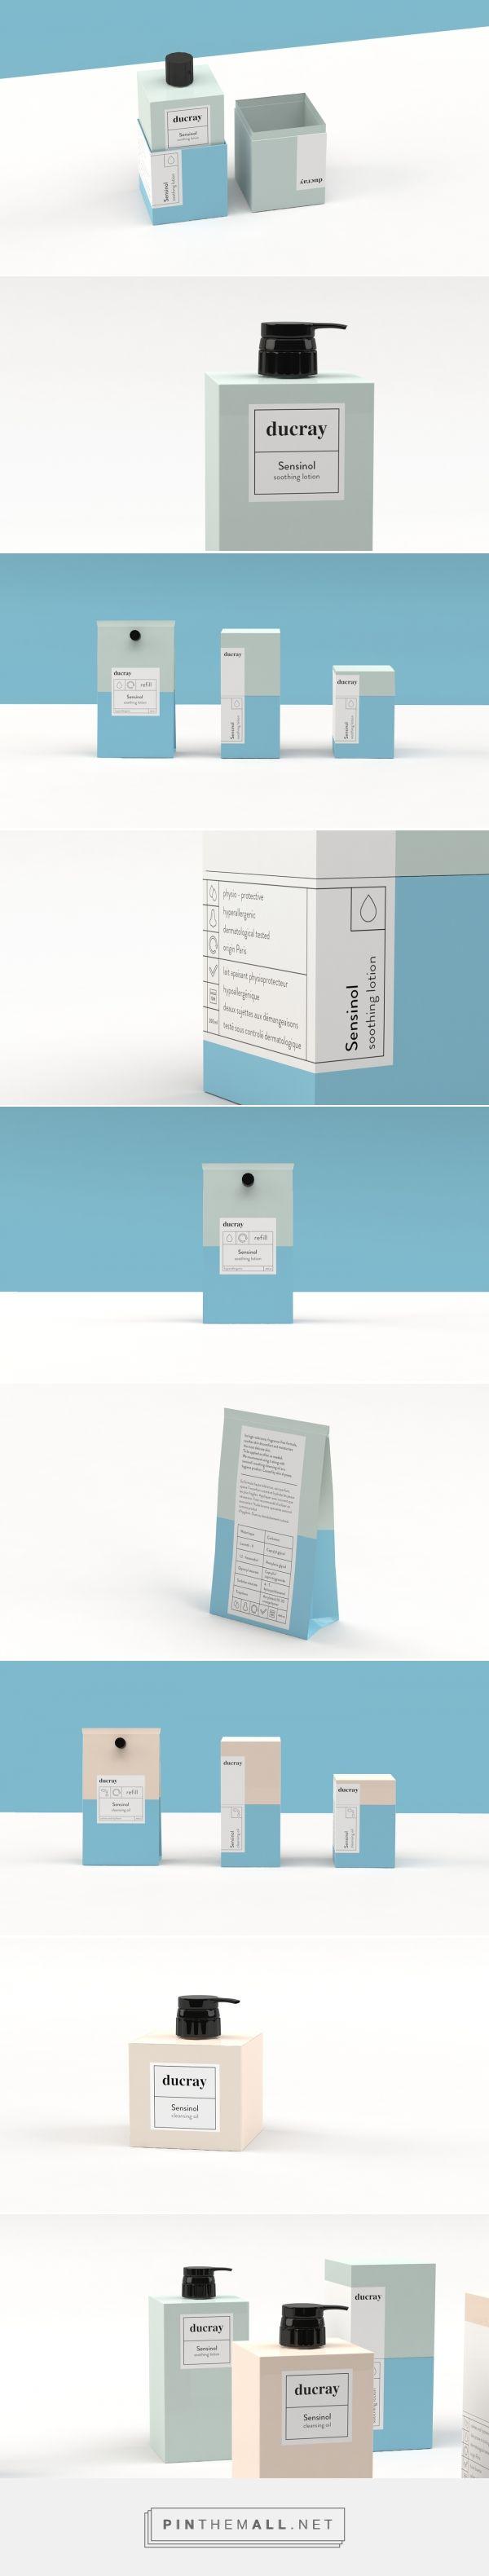 Ducray Sensinol by Tone Næss and Brage Istad Brenna-Lund @ Filomena Spa Pinterest #Lifestyle #Wellness #FilomenaSp